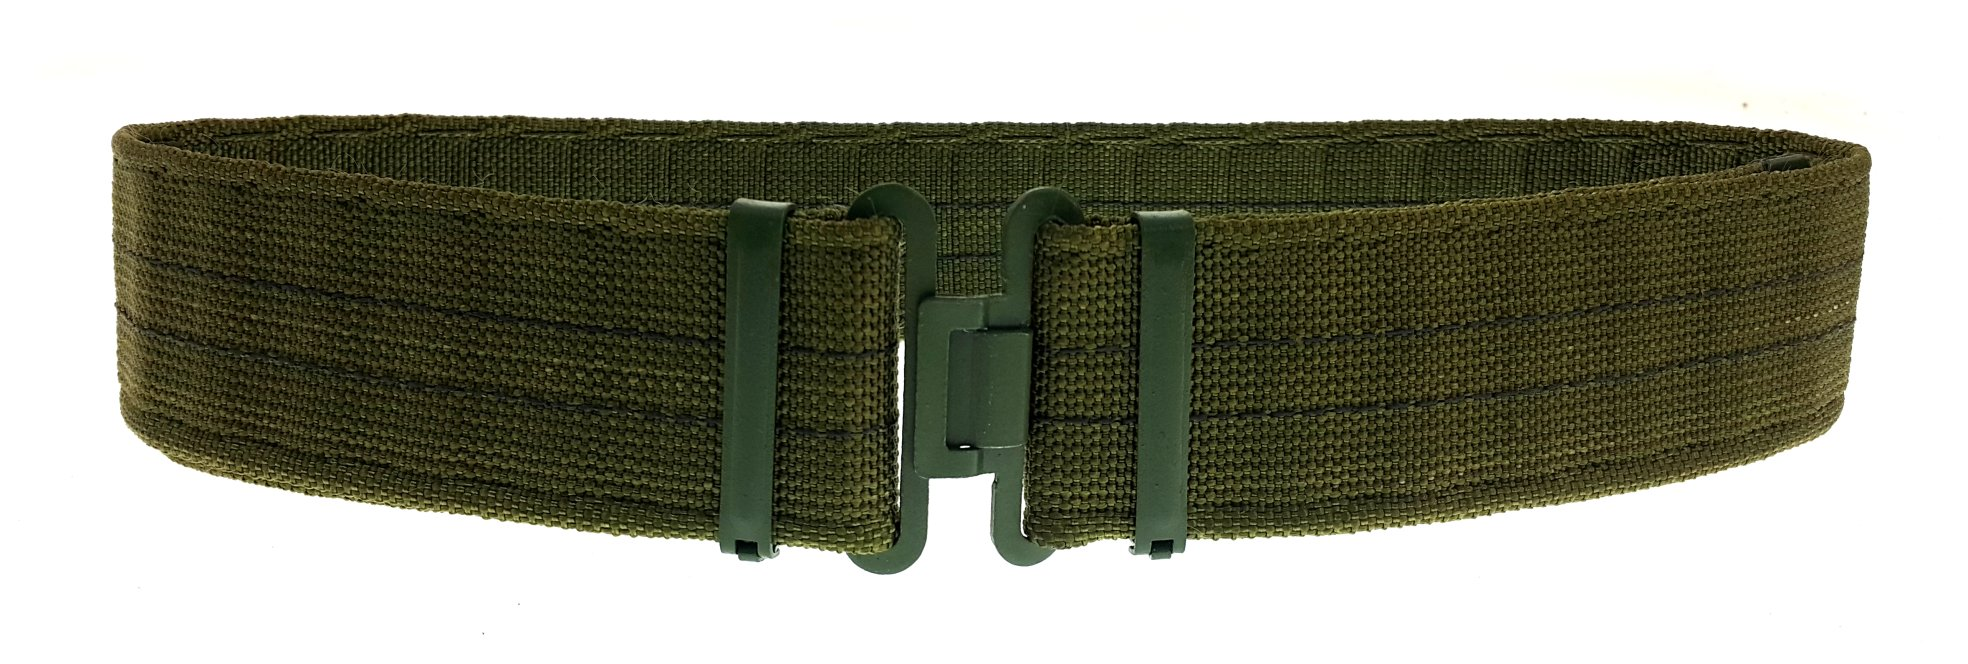 Item original strong BELT MILITARY belt 110cm NVA new